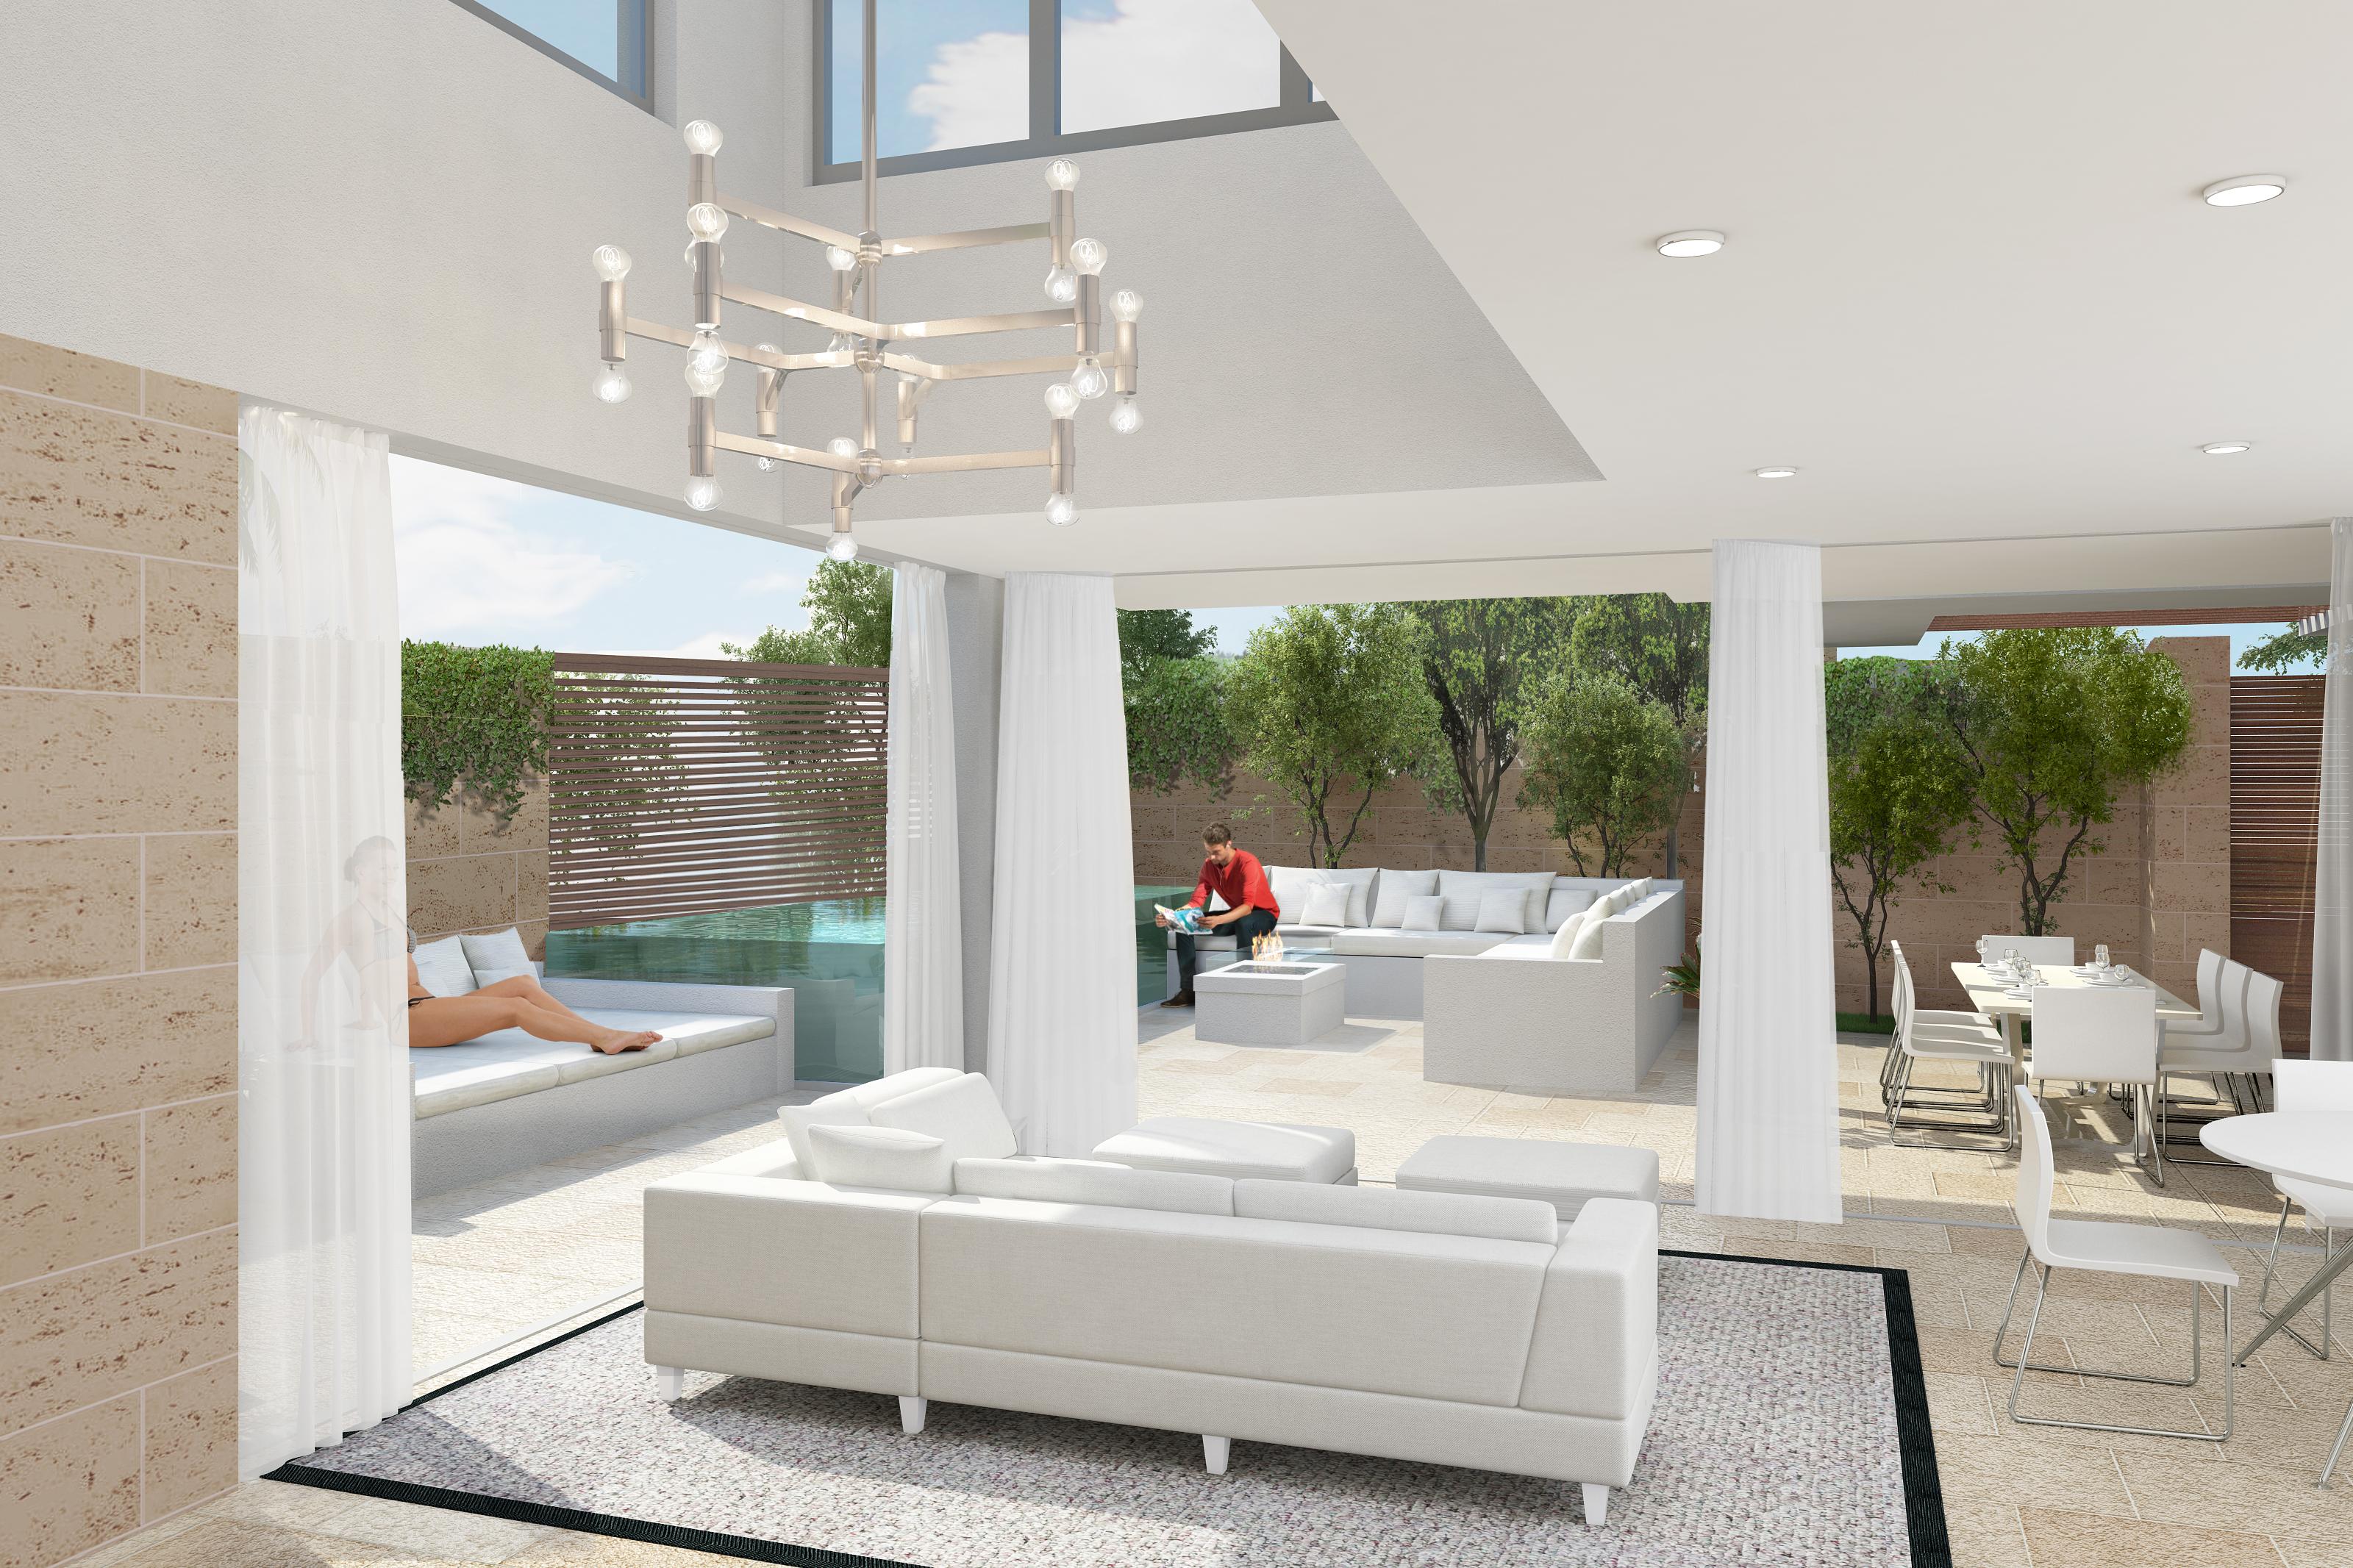 11 Interior villa double space.jpg